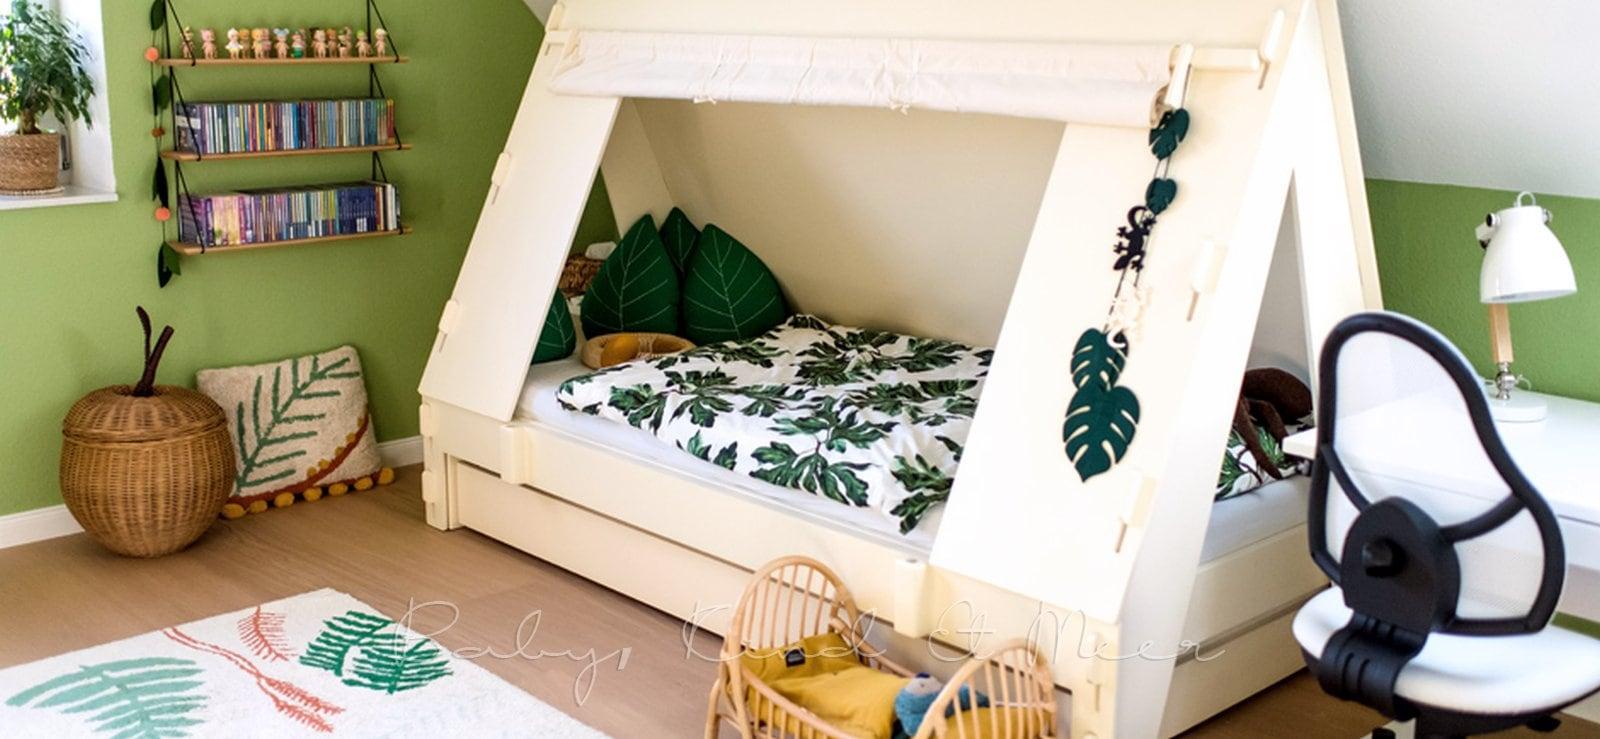 Full Size of Sprossenwand Kinderzimmer Lottes Neues Co Regal Weiß Sofa Regale Kinderzimmer Sprossenwand Kinderzimmer